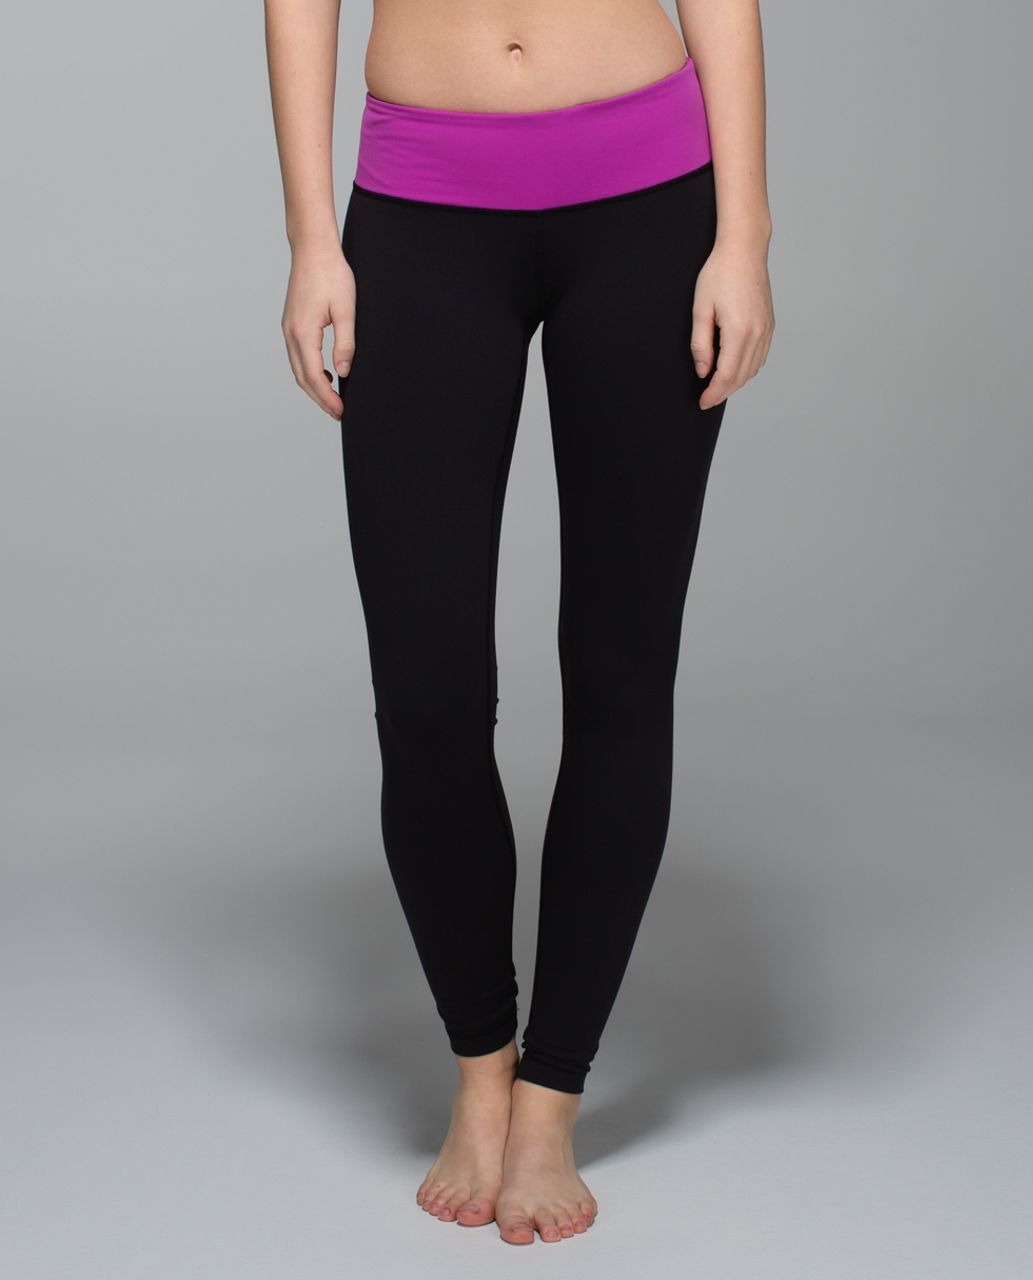 Lululemon Wunder Under Pant *Full-On Luon - Black /  Ultra Violet